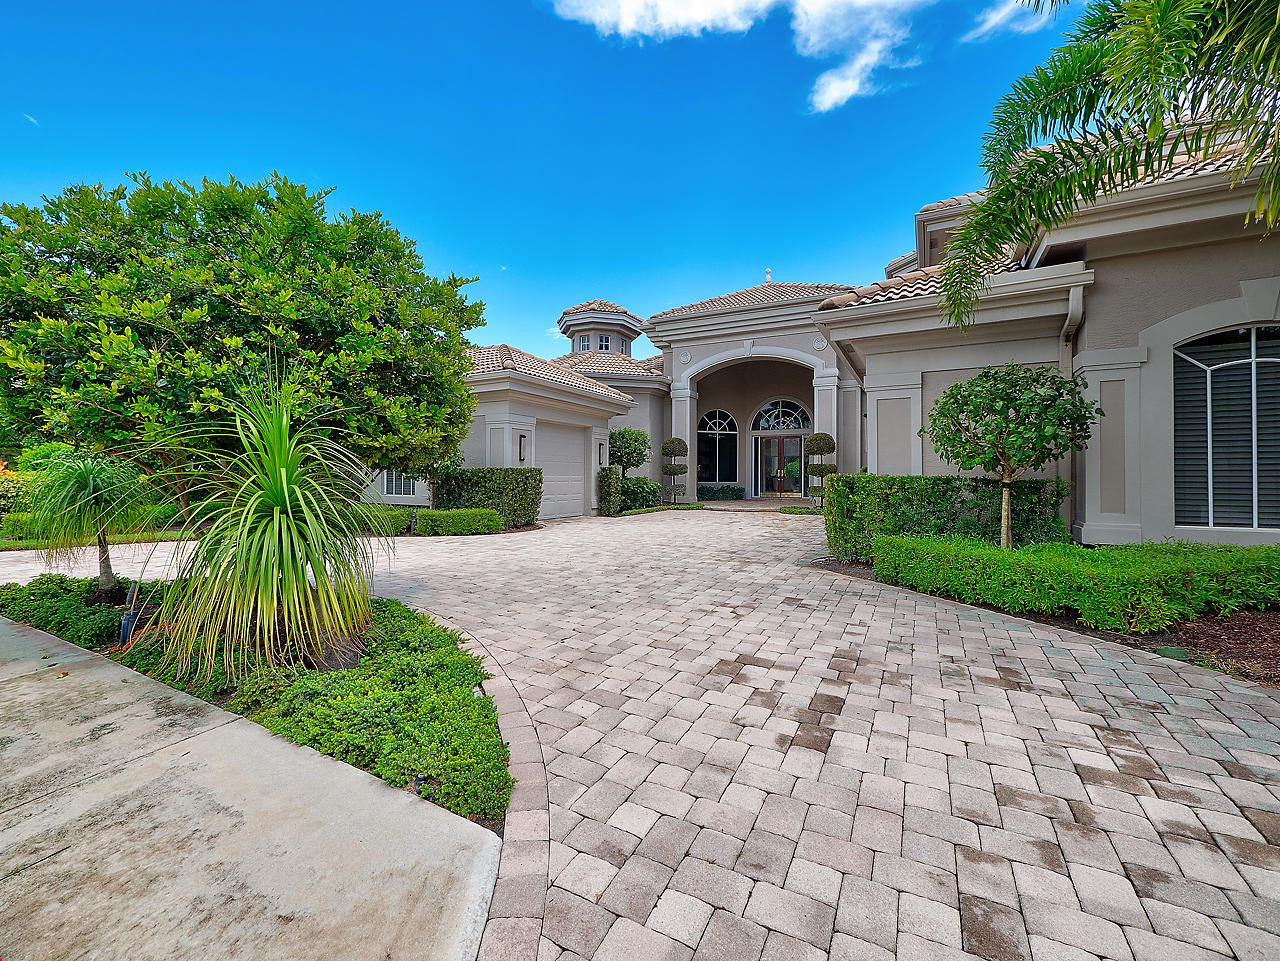 Photo of 104 Saint Martin Drive, Palm Beach Gardens, FL 33418 (MLS # RX-10653475)